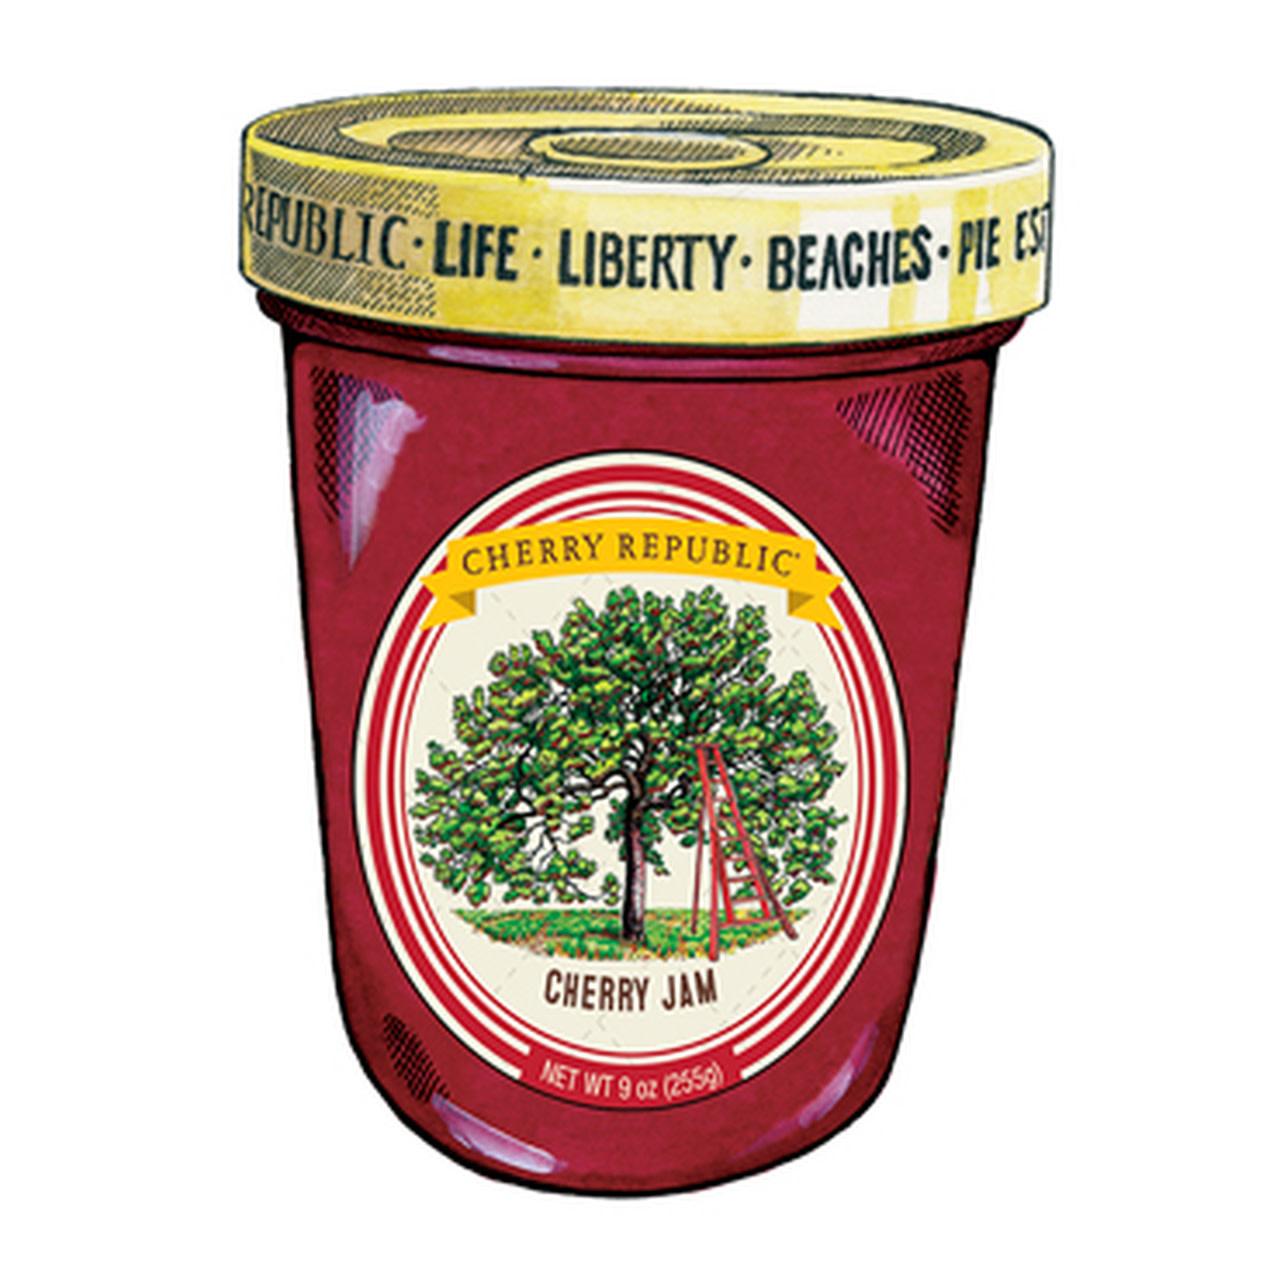 Cherry Republic Cherry Republic Cherry Jam 9oz